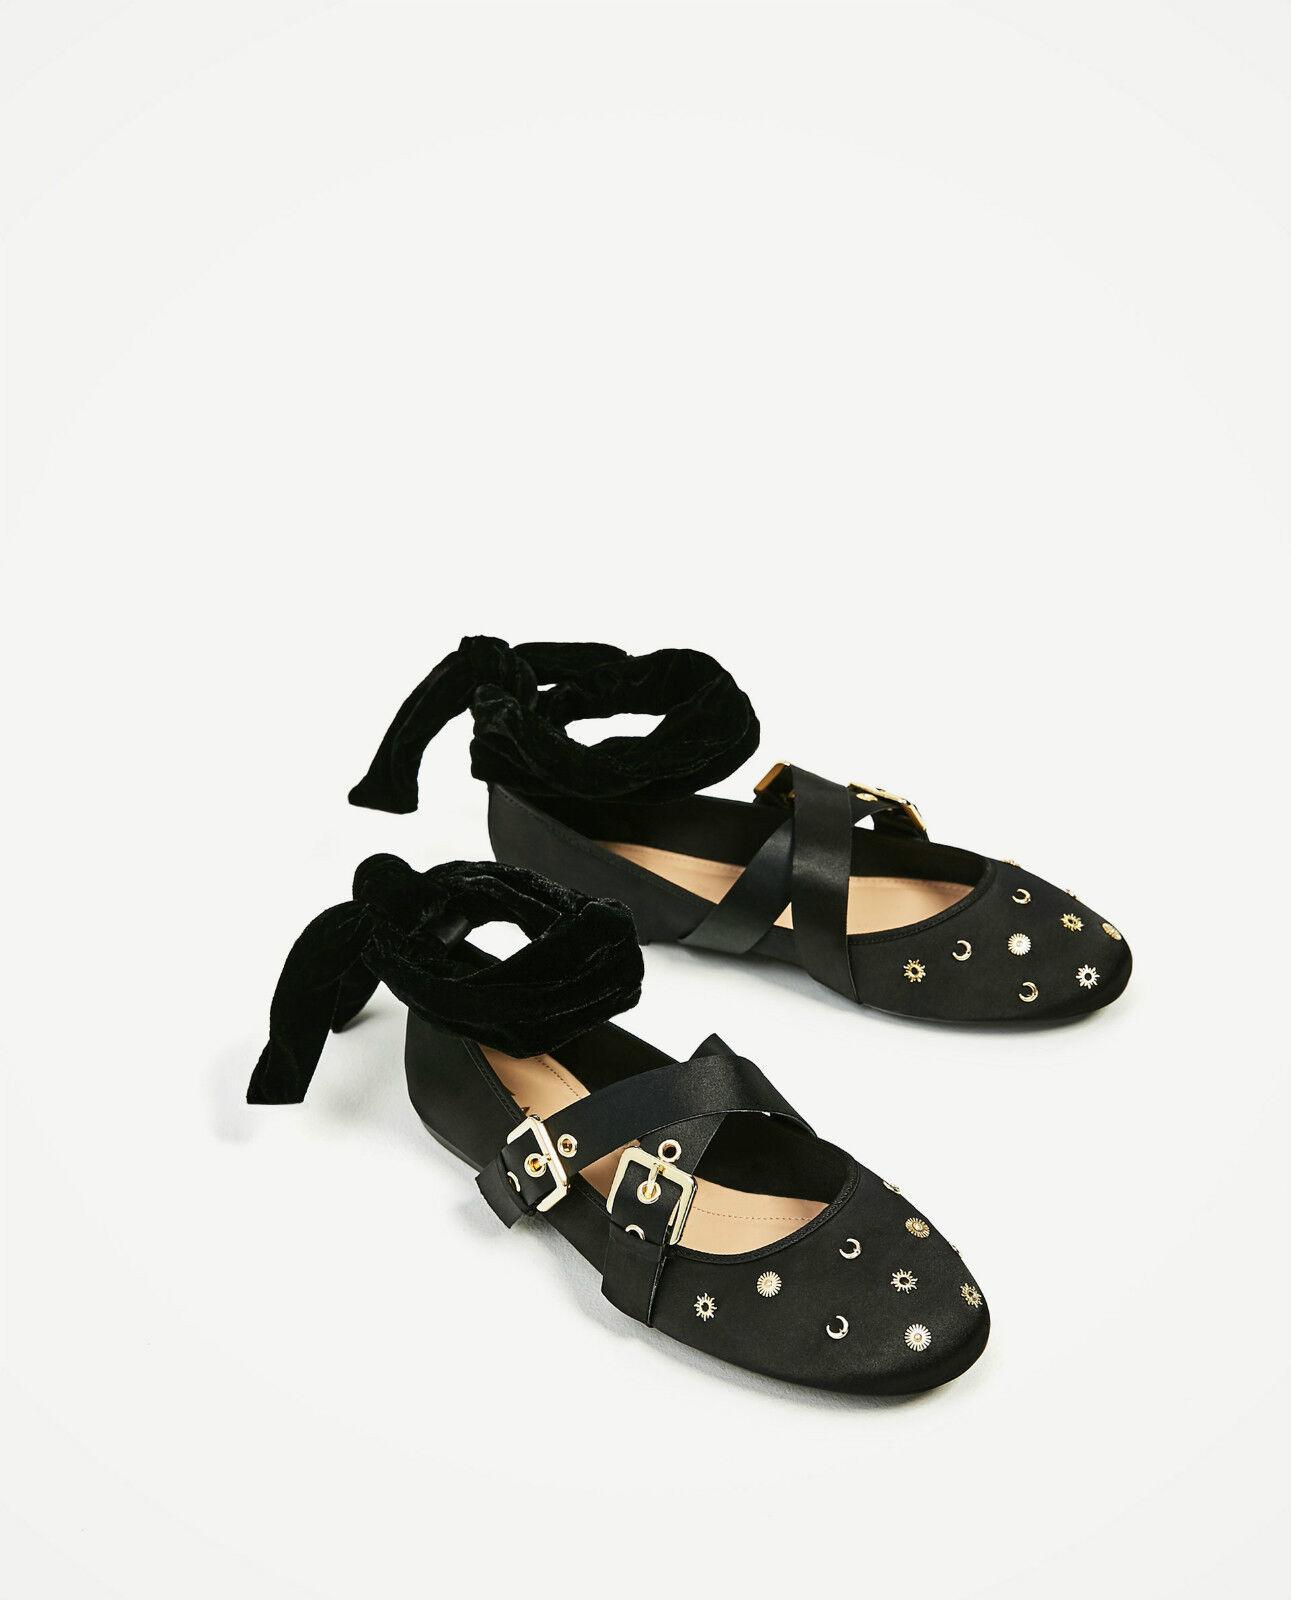 Zara Ballerinas Ballerinas Schuhe UK6 EUR39 US8